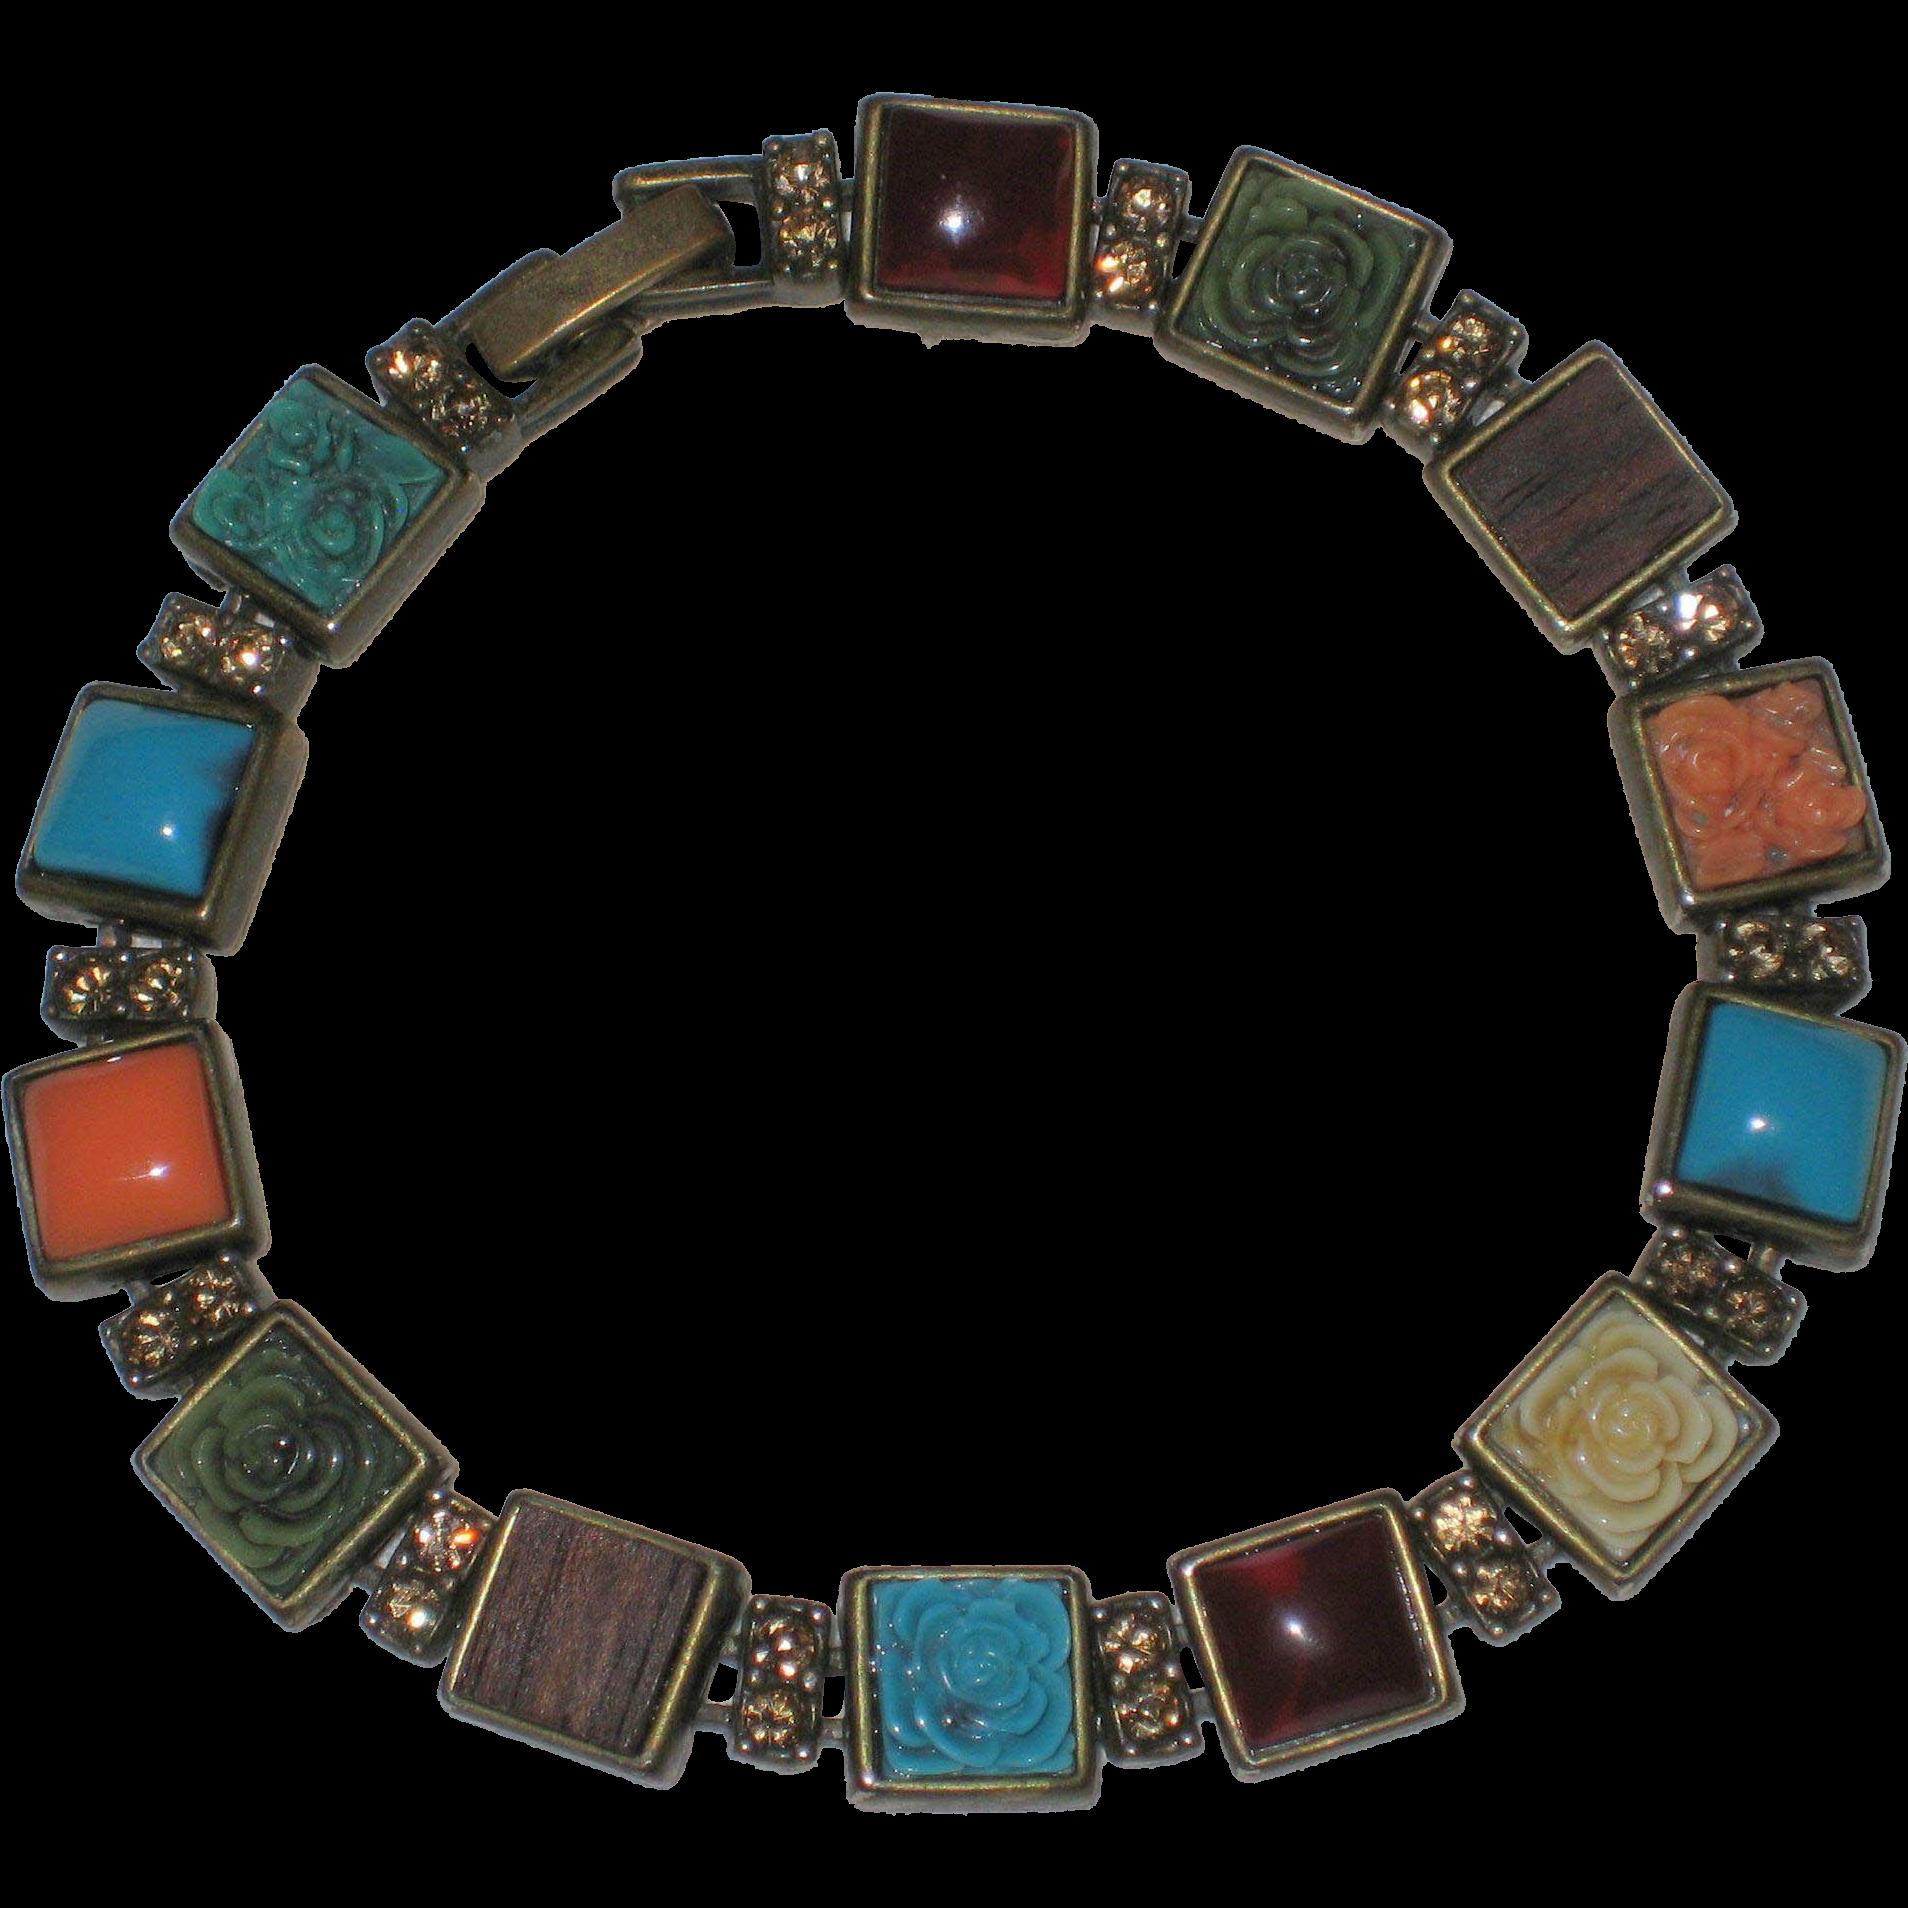 Liz Claiborne Signed Multi-colored Tile Bracelet